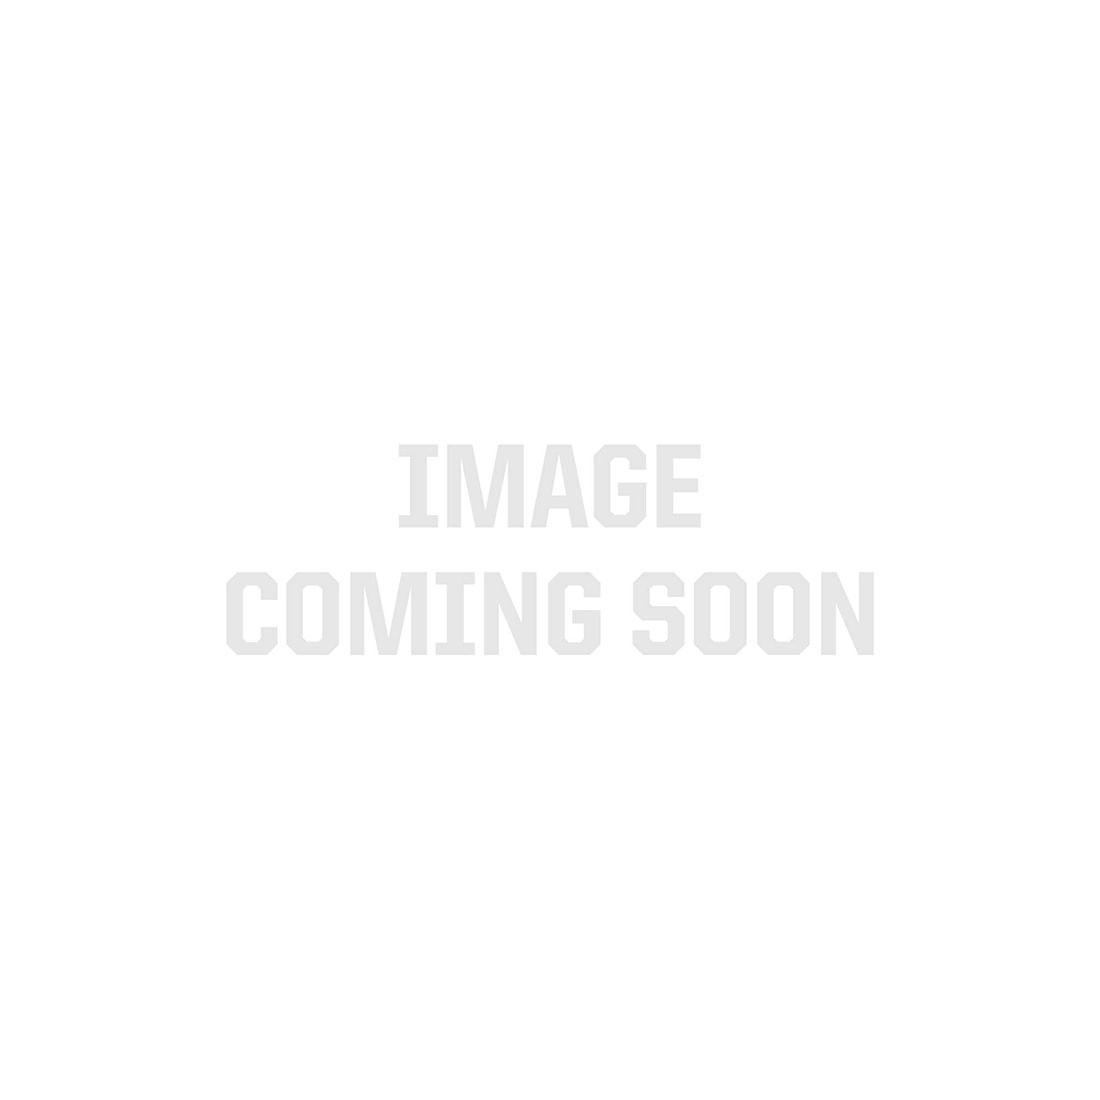 Customizable Shelf Light Bar - 2,700K - 16 LEDs - 280mm